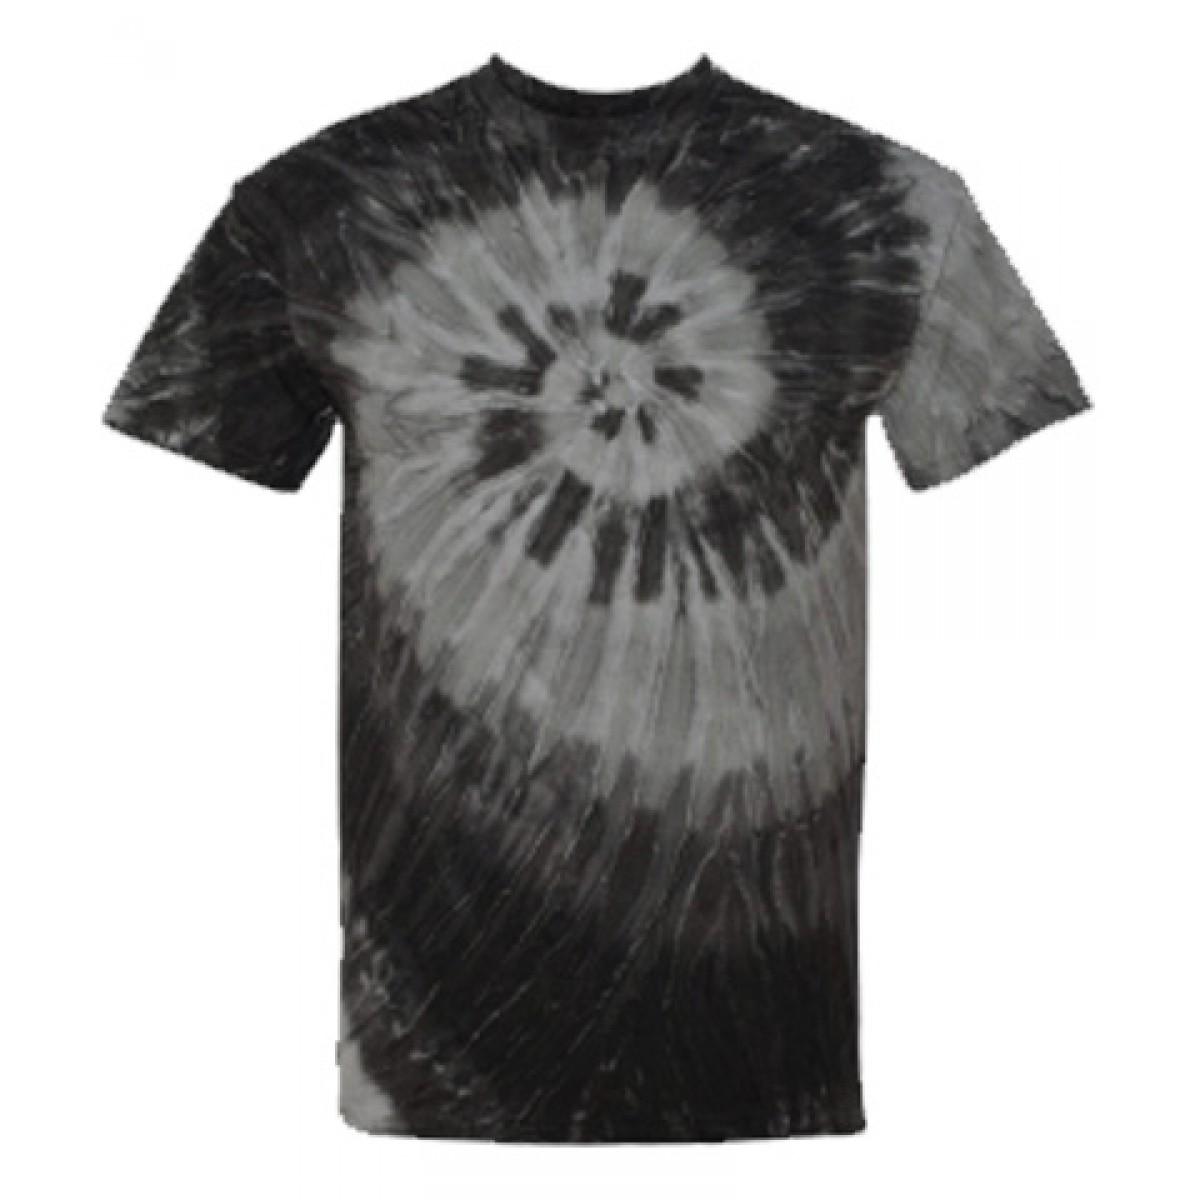 Blue or Black Ripple Tie Dye T-Shirt-White/Black-S